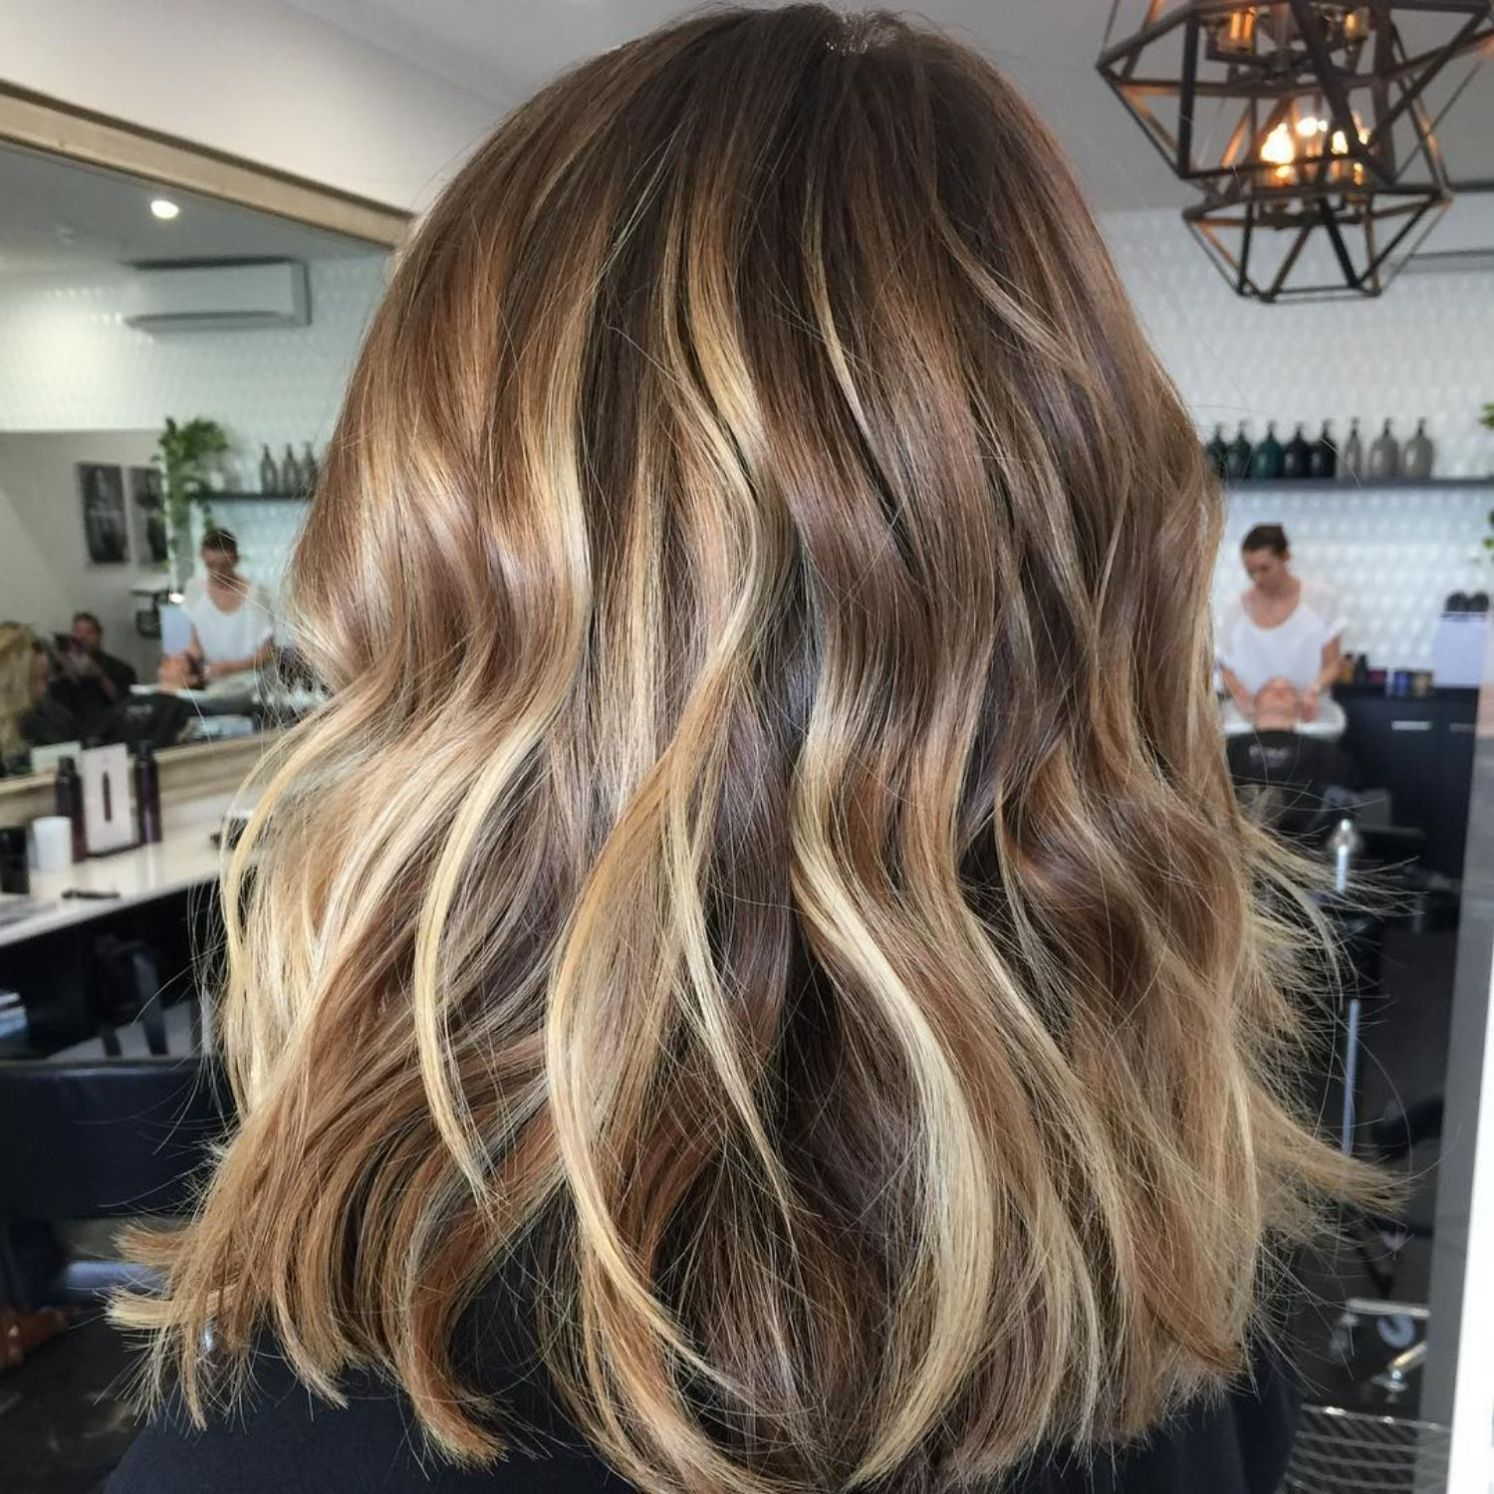 60 Looks With Caramel Highlights On Brown And Dark Brown Hair Hair Styles Light Brown Hair Long Hair Styles